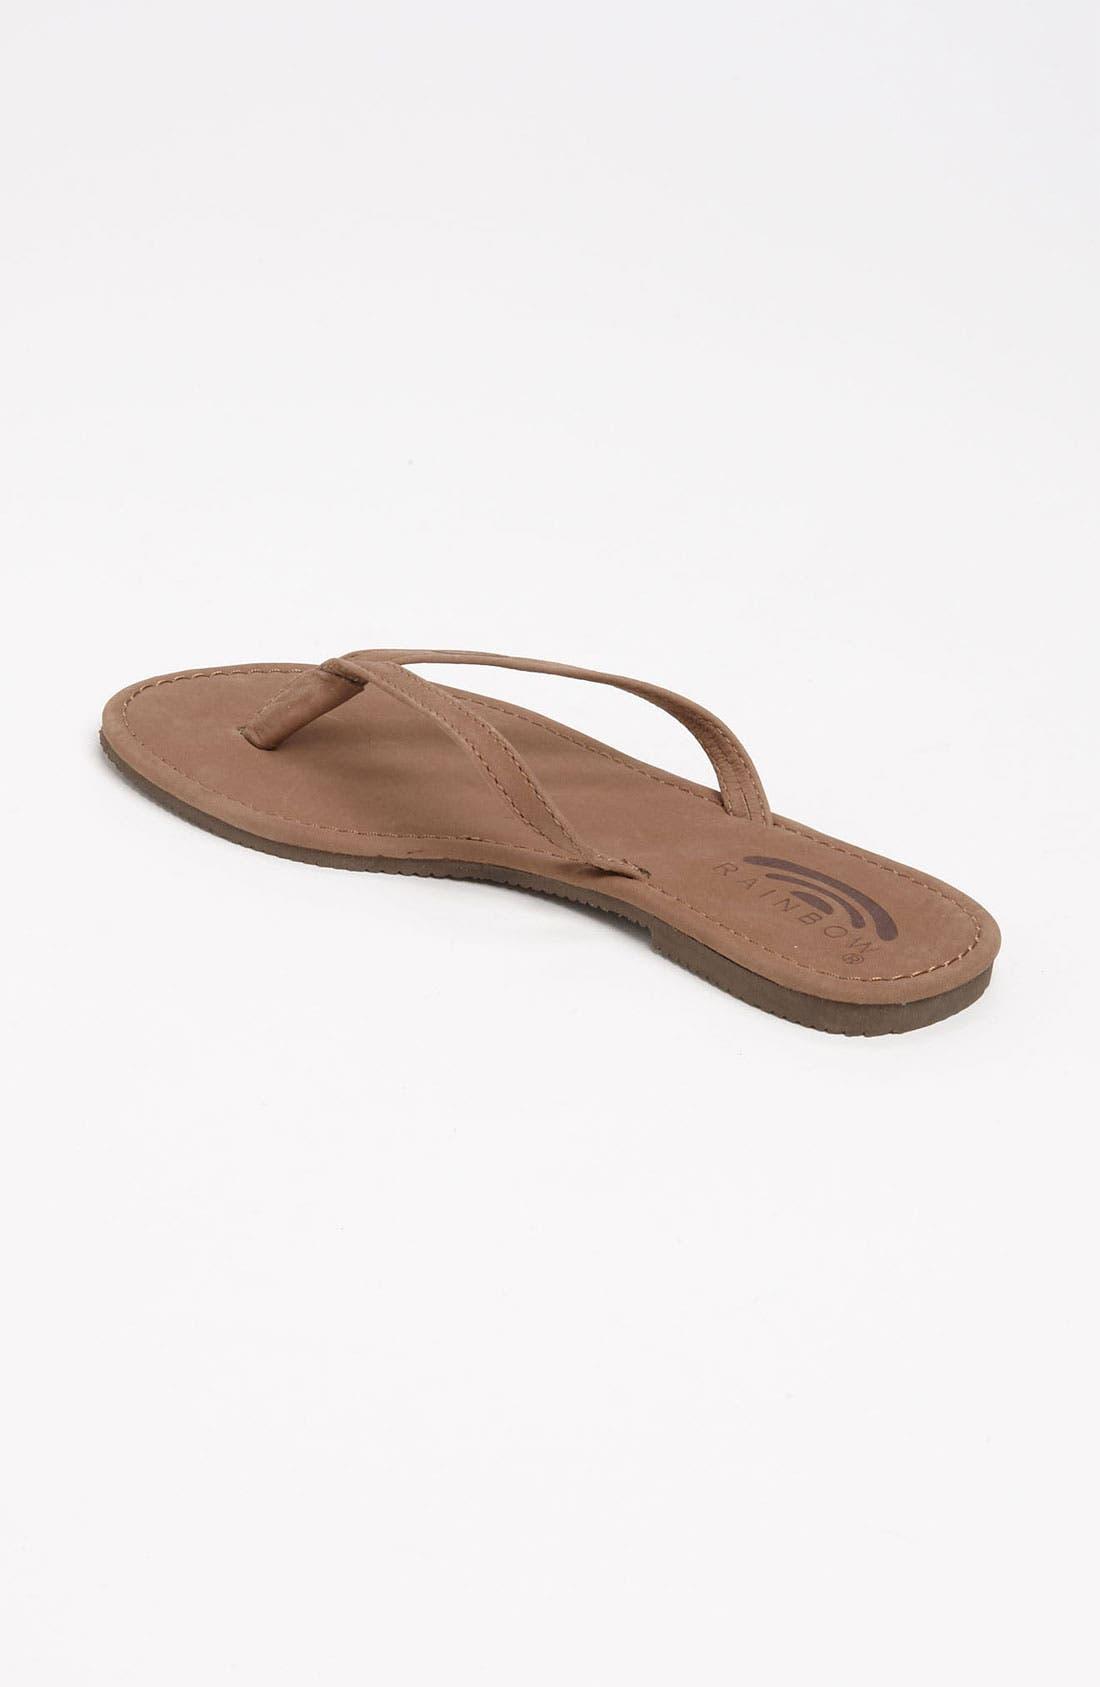 5c401c48095d Rainbow tango flip flop women nordstrom jpg 1318x1416 Rainbow tango sandals